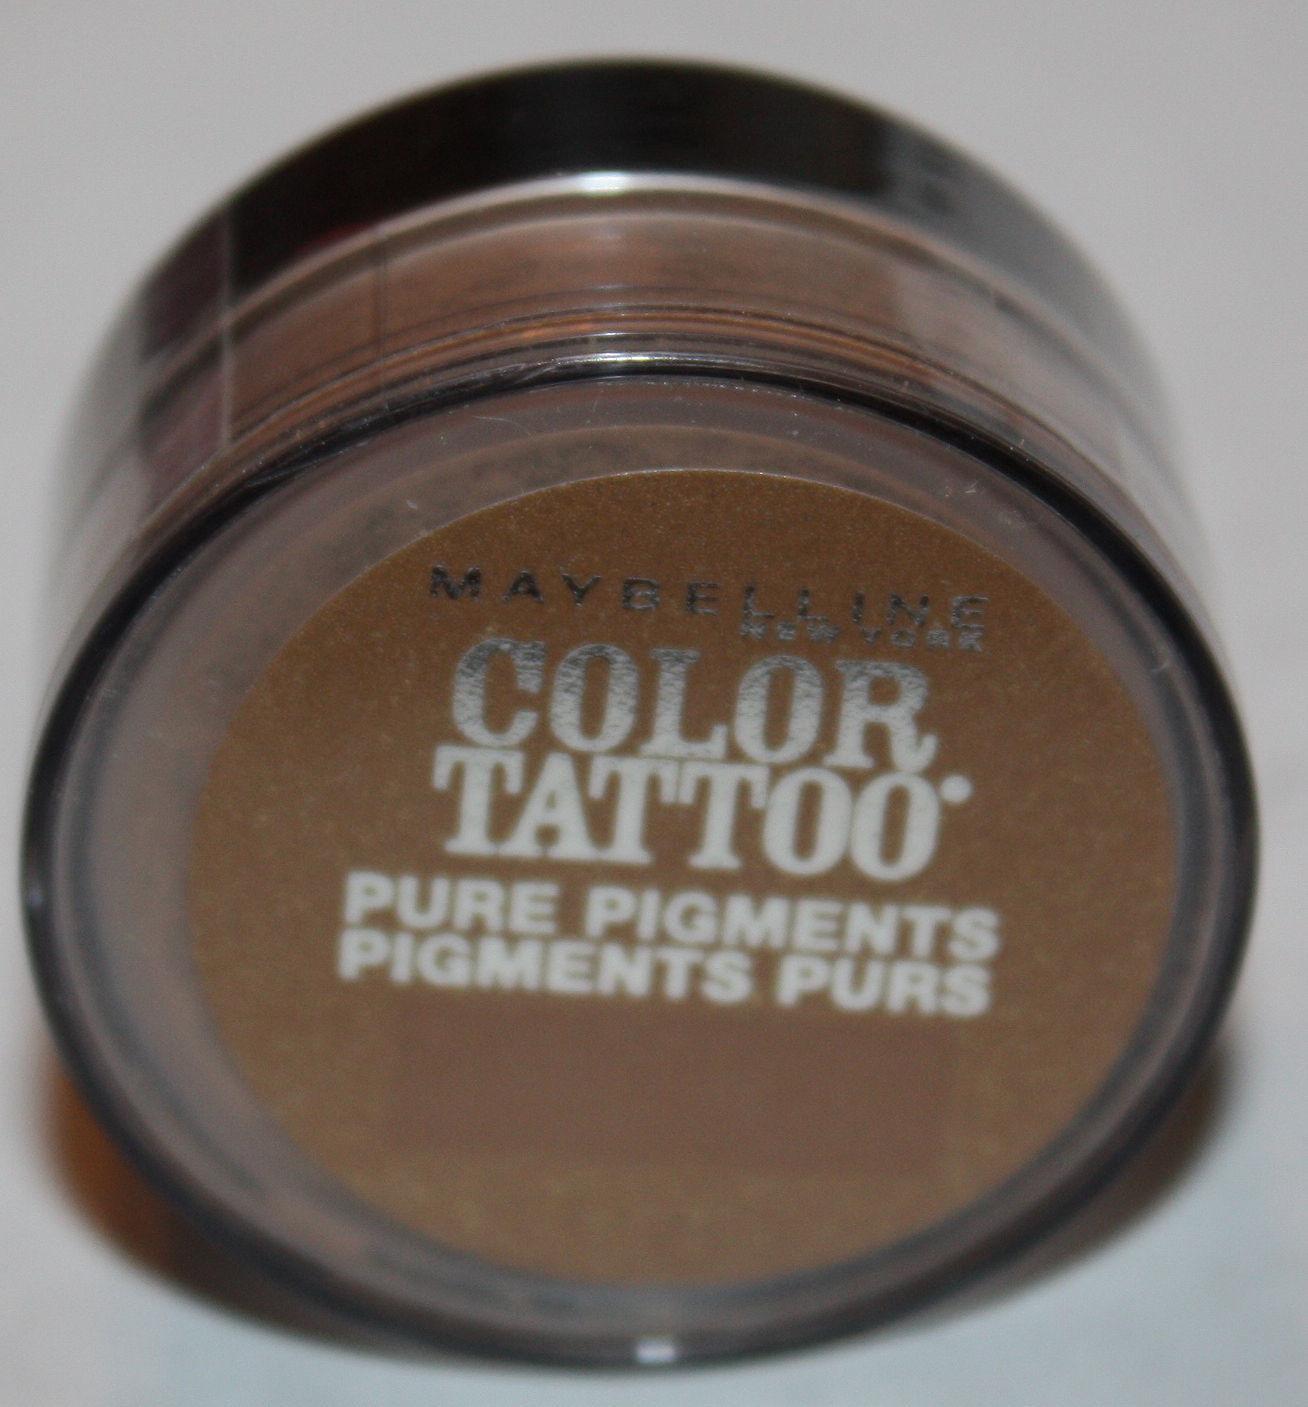 Maybelline Color Tattoo Pure Pigments Eyeshadow -#60 Buff & Tuff